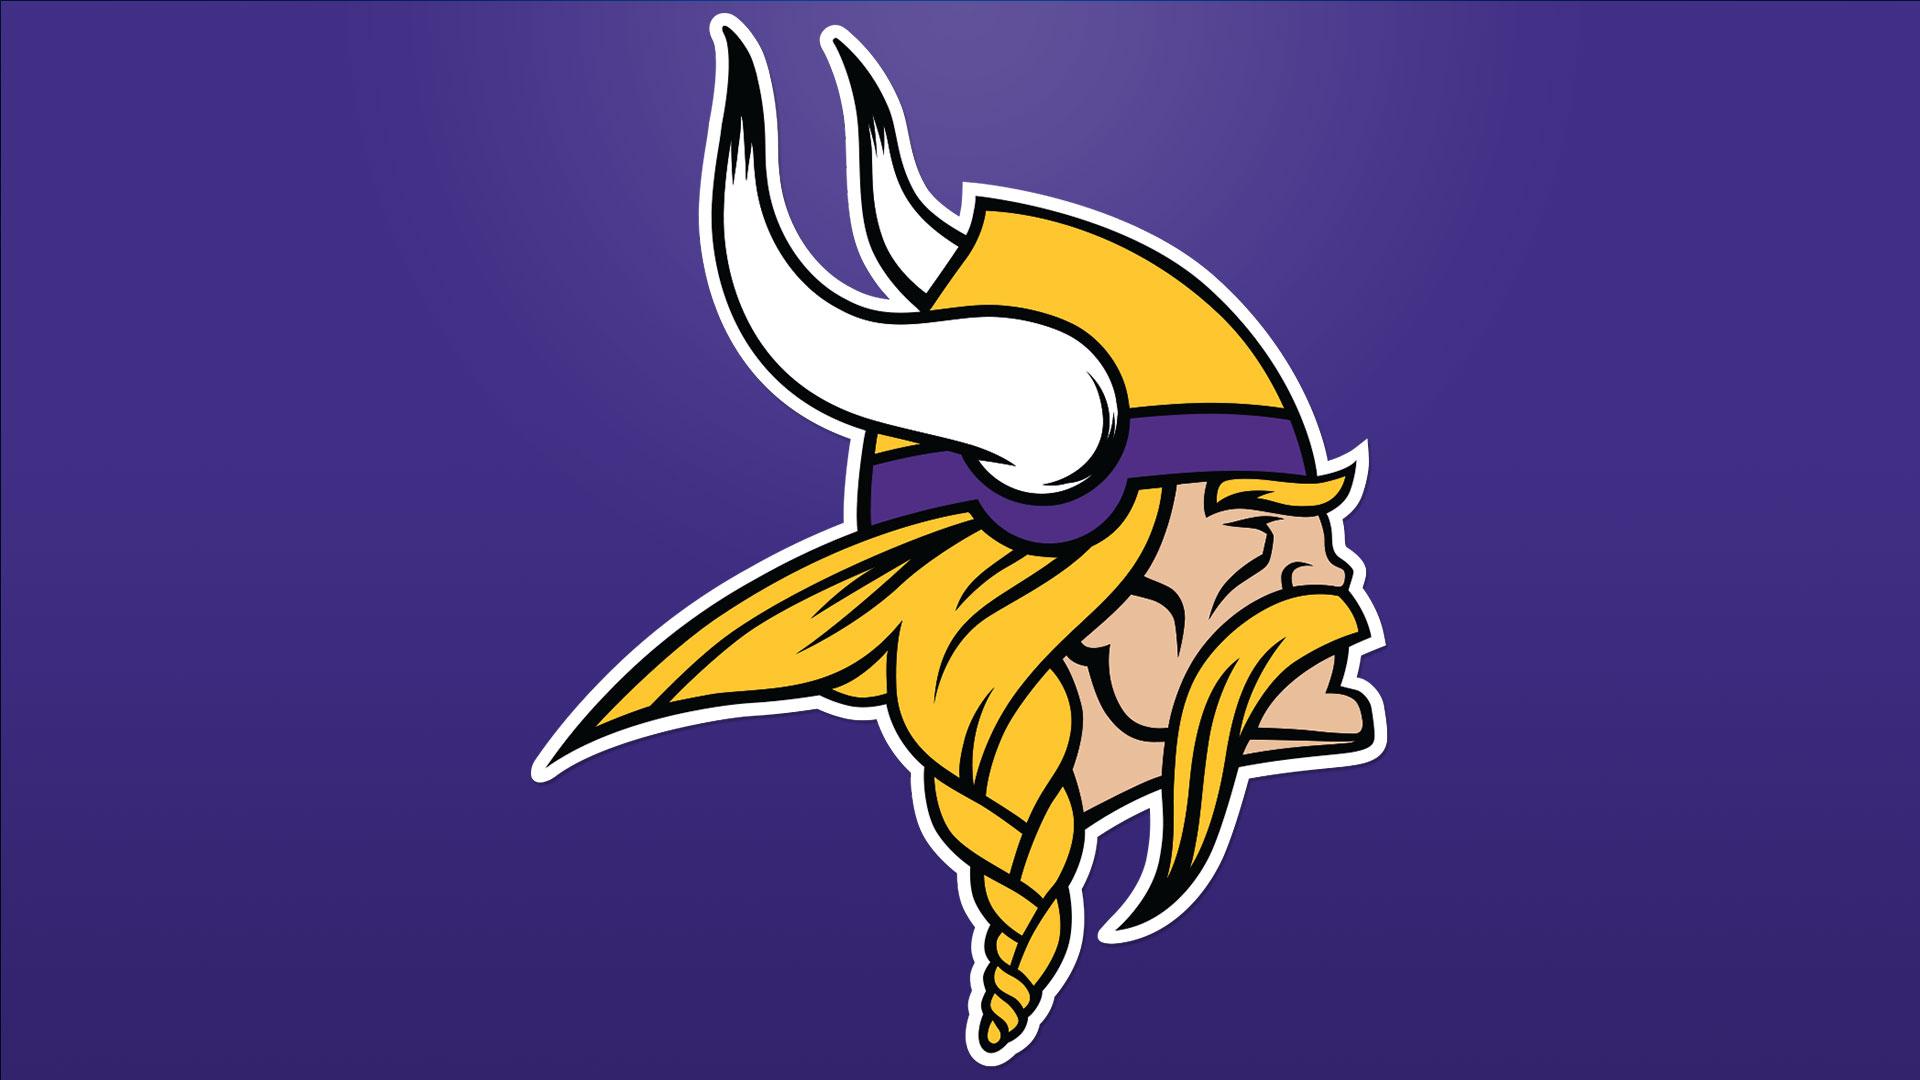 KELO-Minnesota-Vikings-logo_1529375698506.jpg